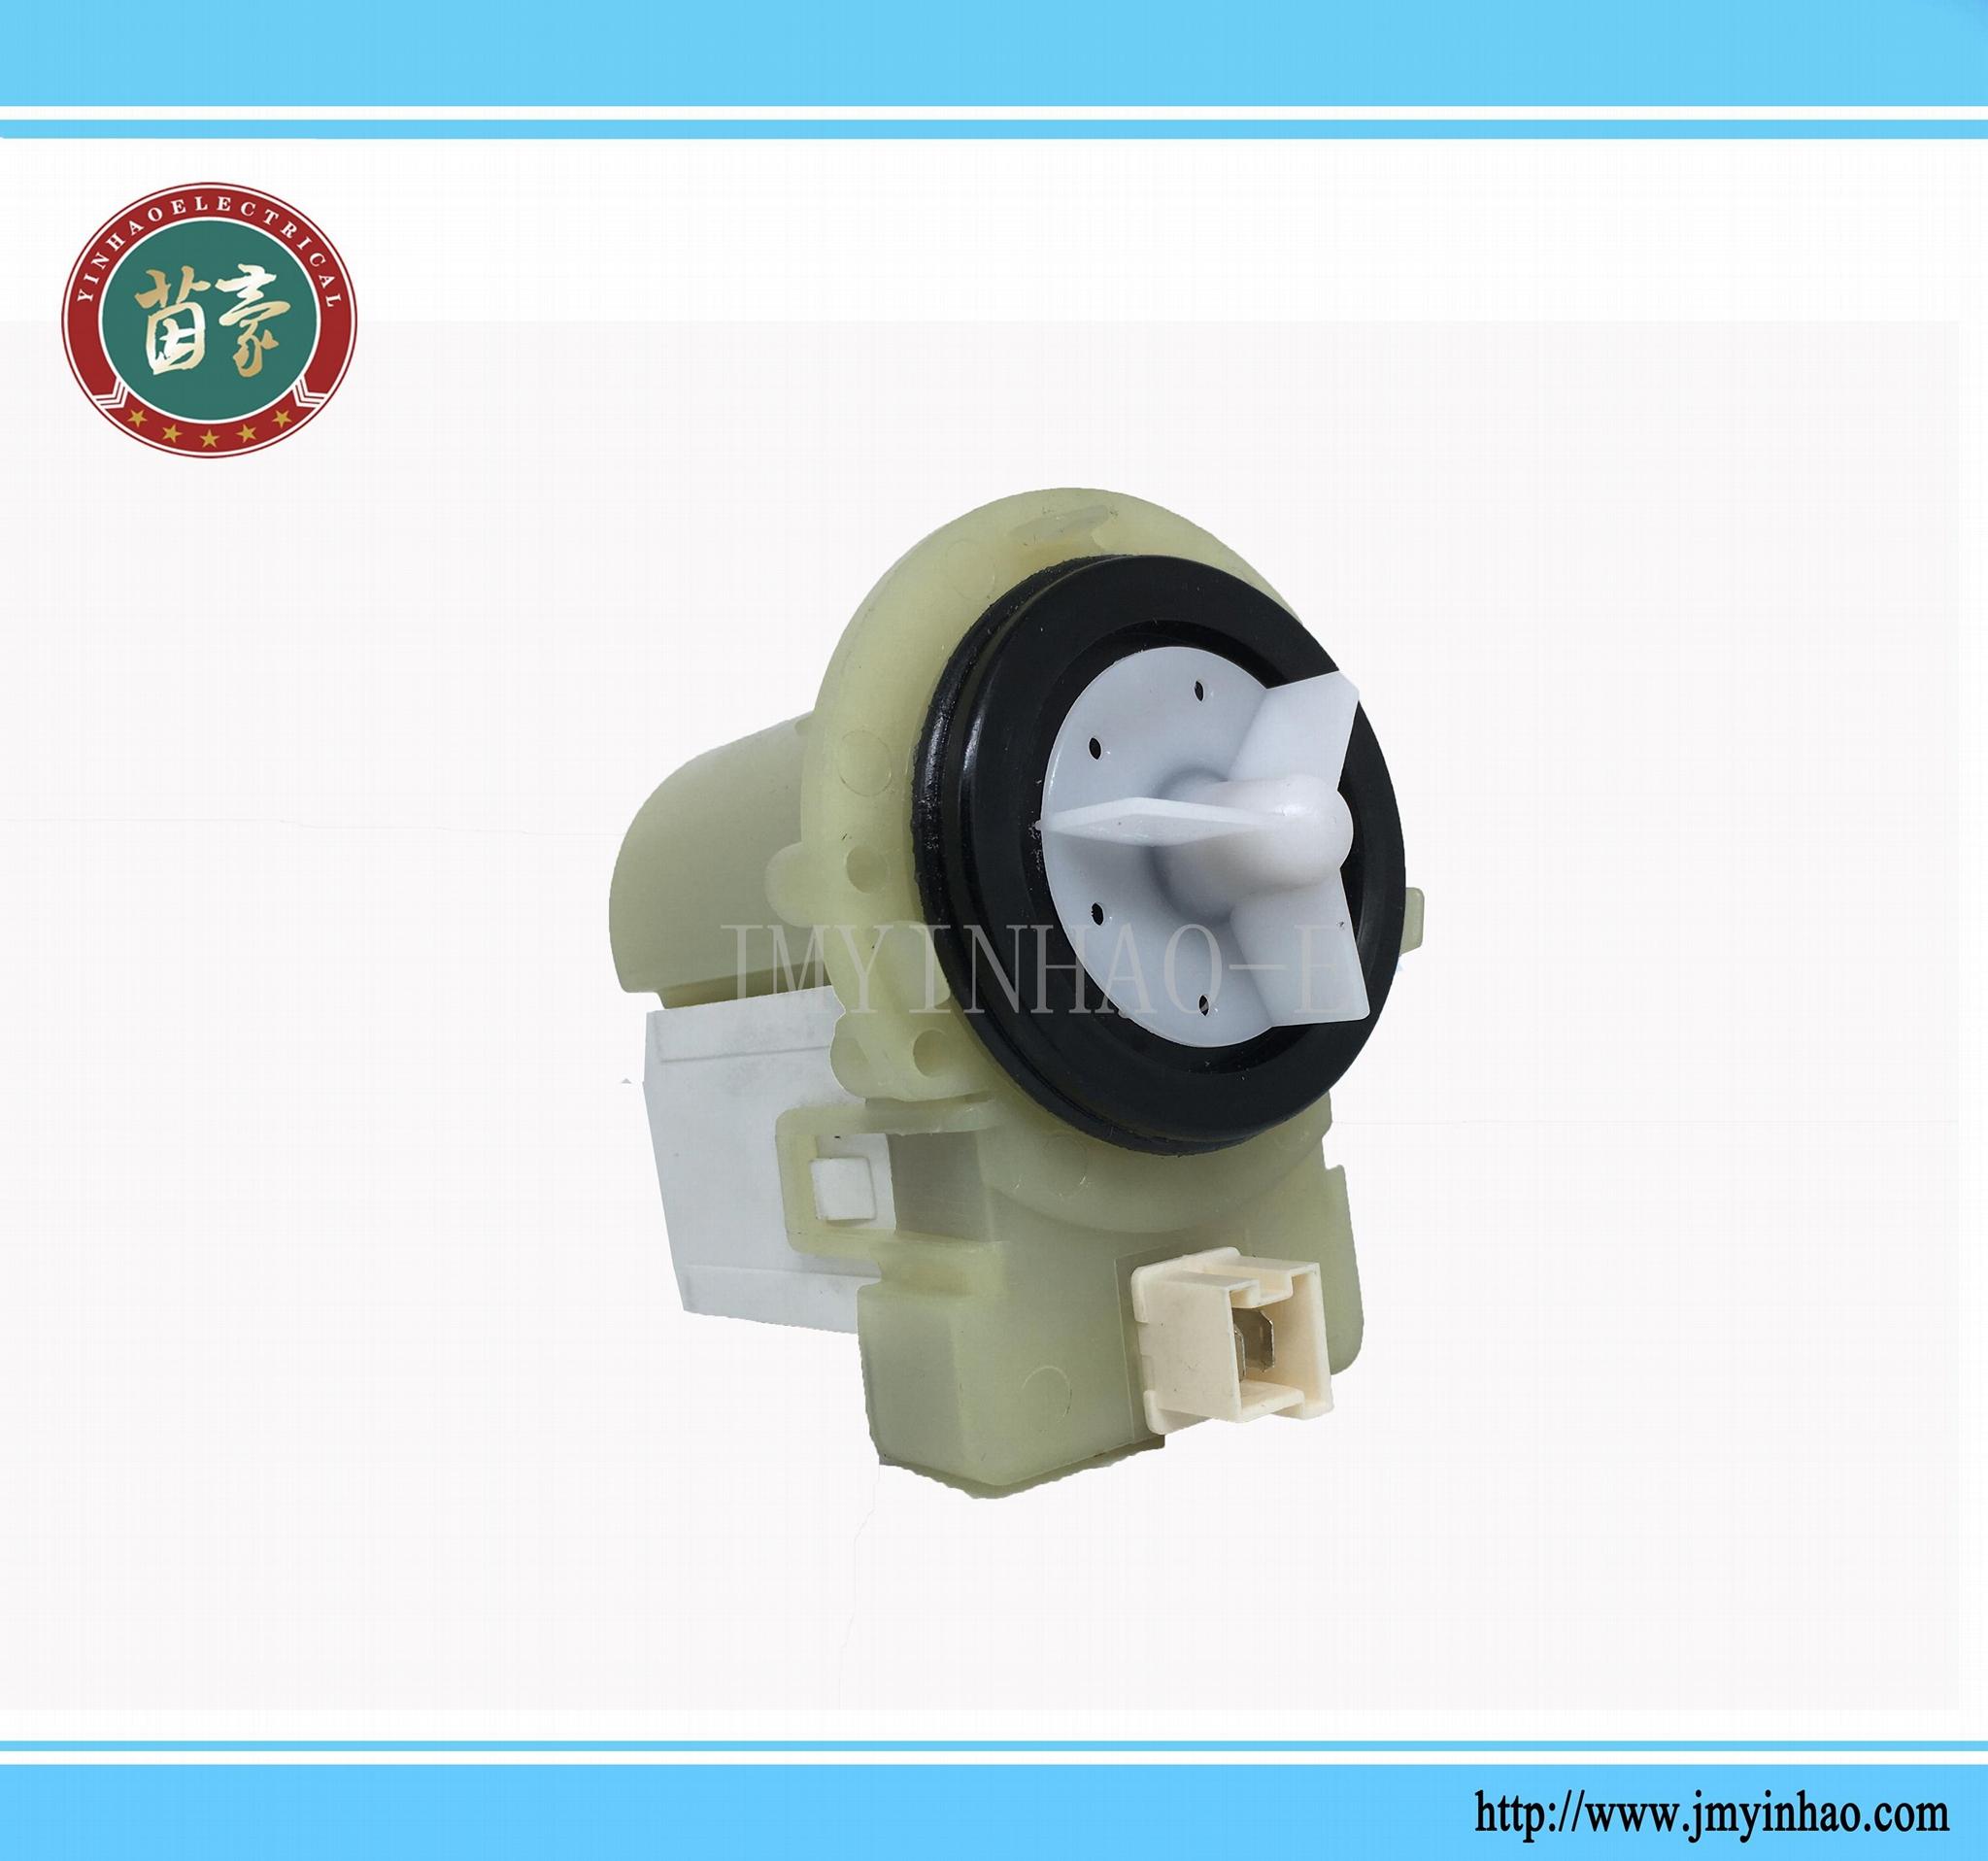 DC31-00054A Washer Drain Pump for Samsung PS4204638 AP4202690 Washing Machine 4